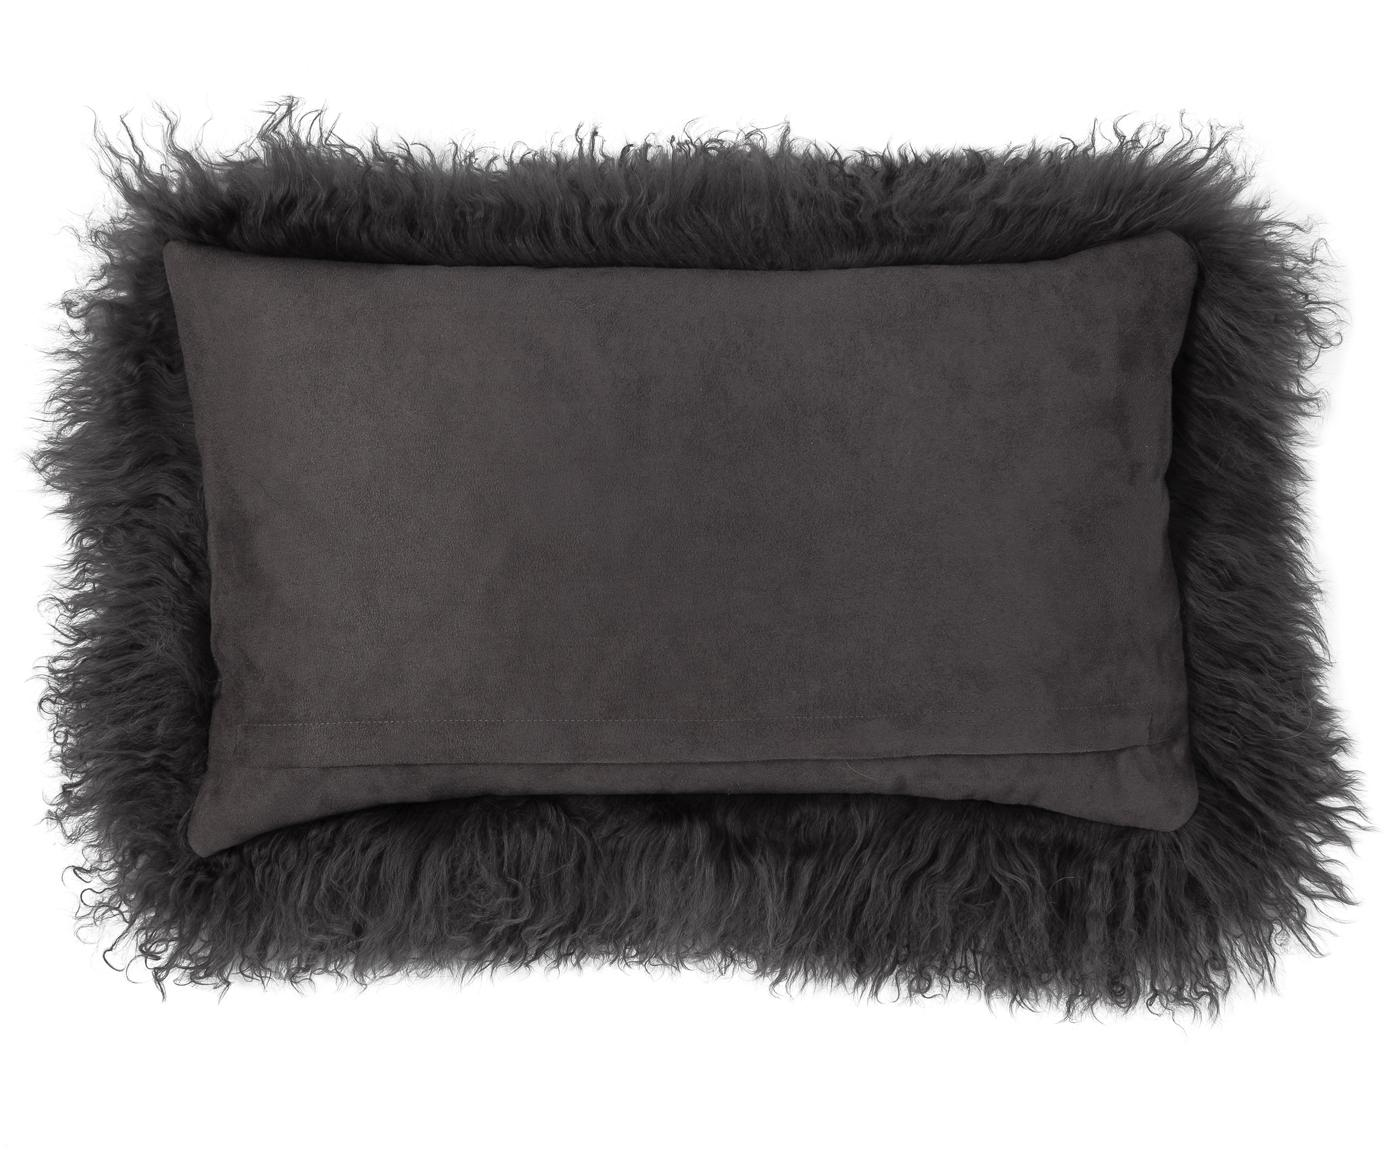 Langhaar-Lammfell Kissenhülle Ella, gelockt, Vorderseite: 100% mongolisches Lammfel, Rückseite: 100% Polyester, Dunkelgrau, 30 x 50 cm